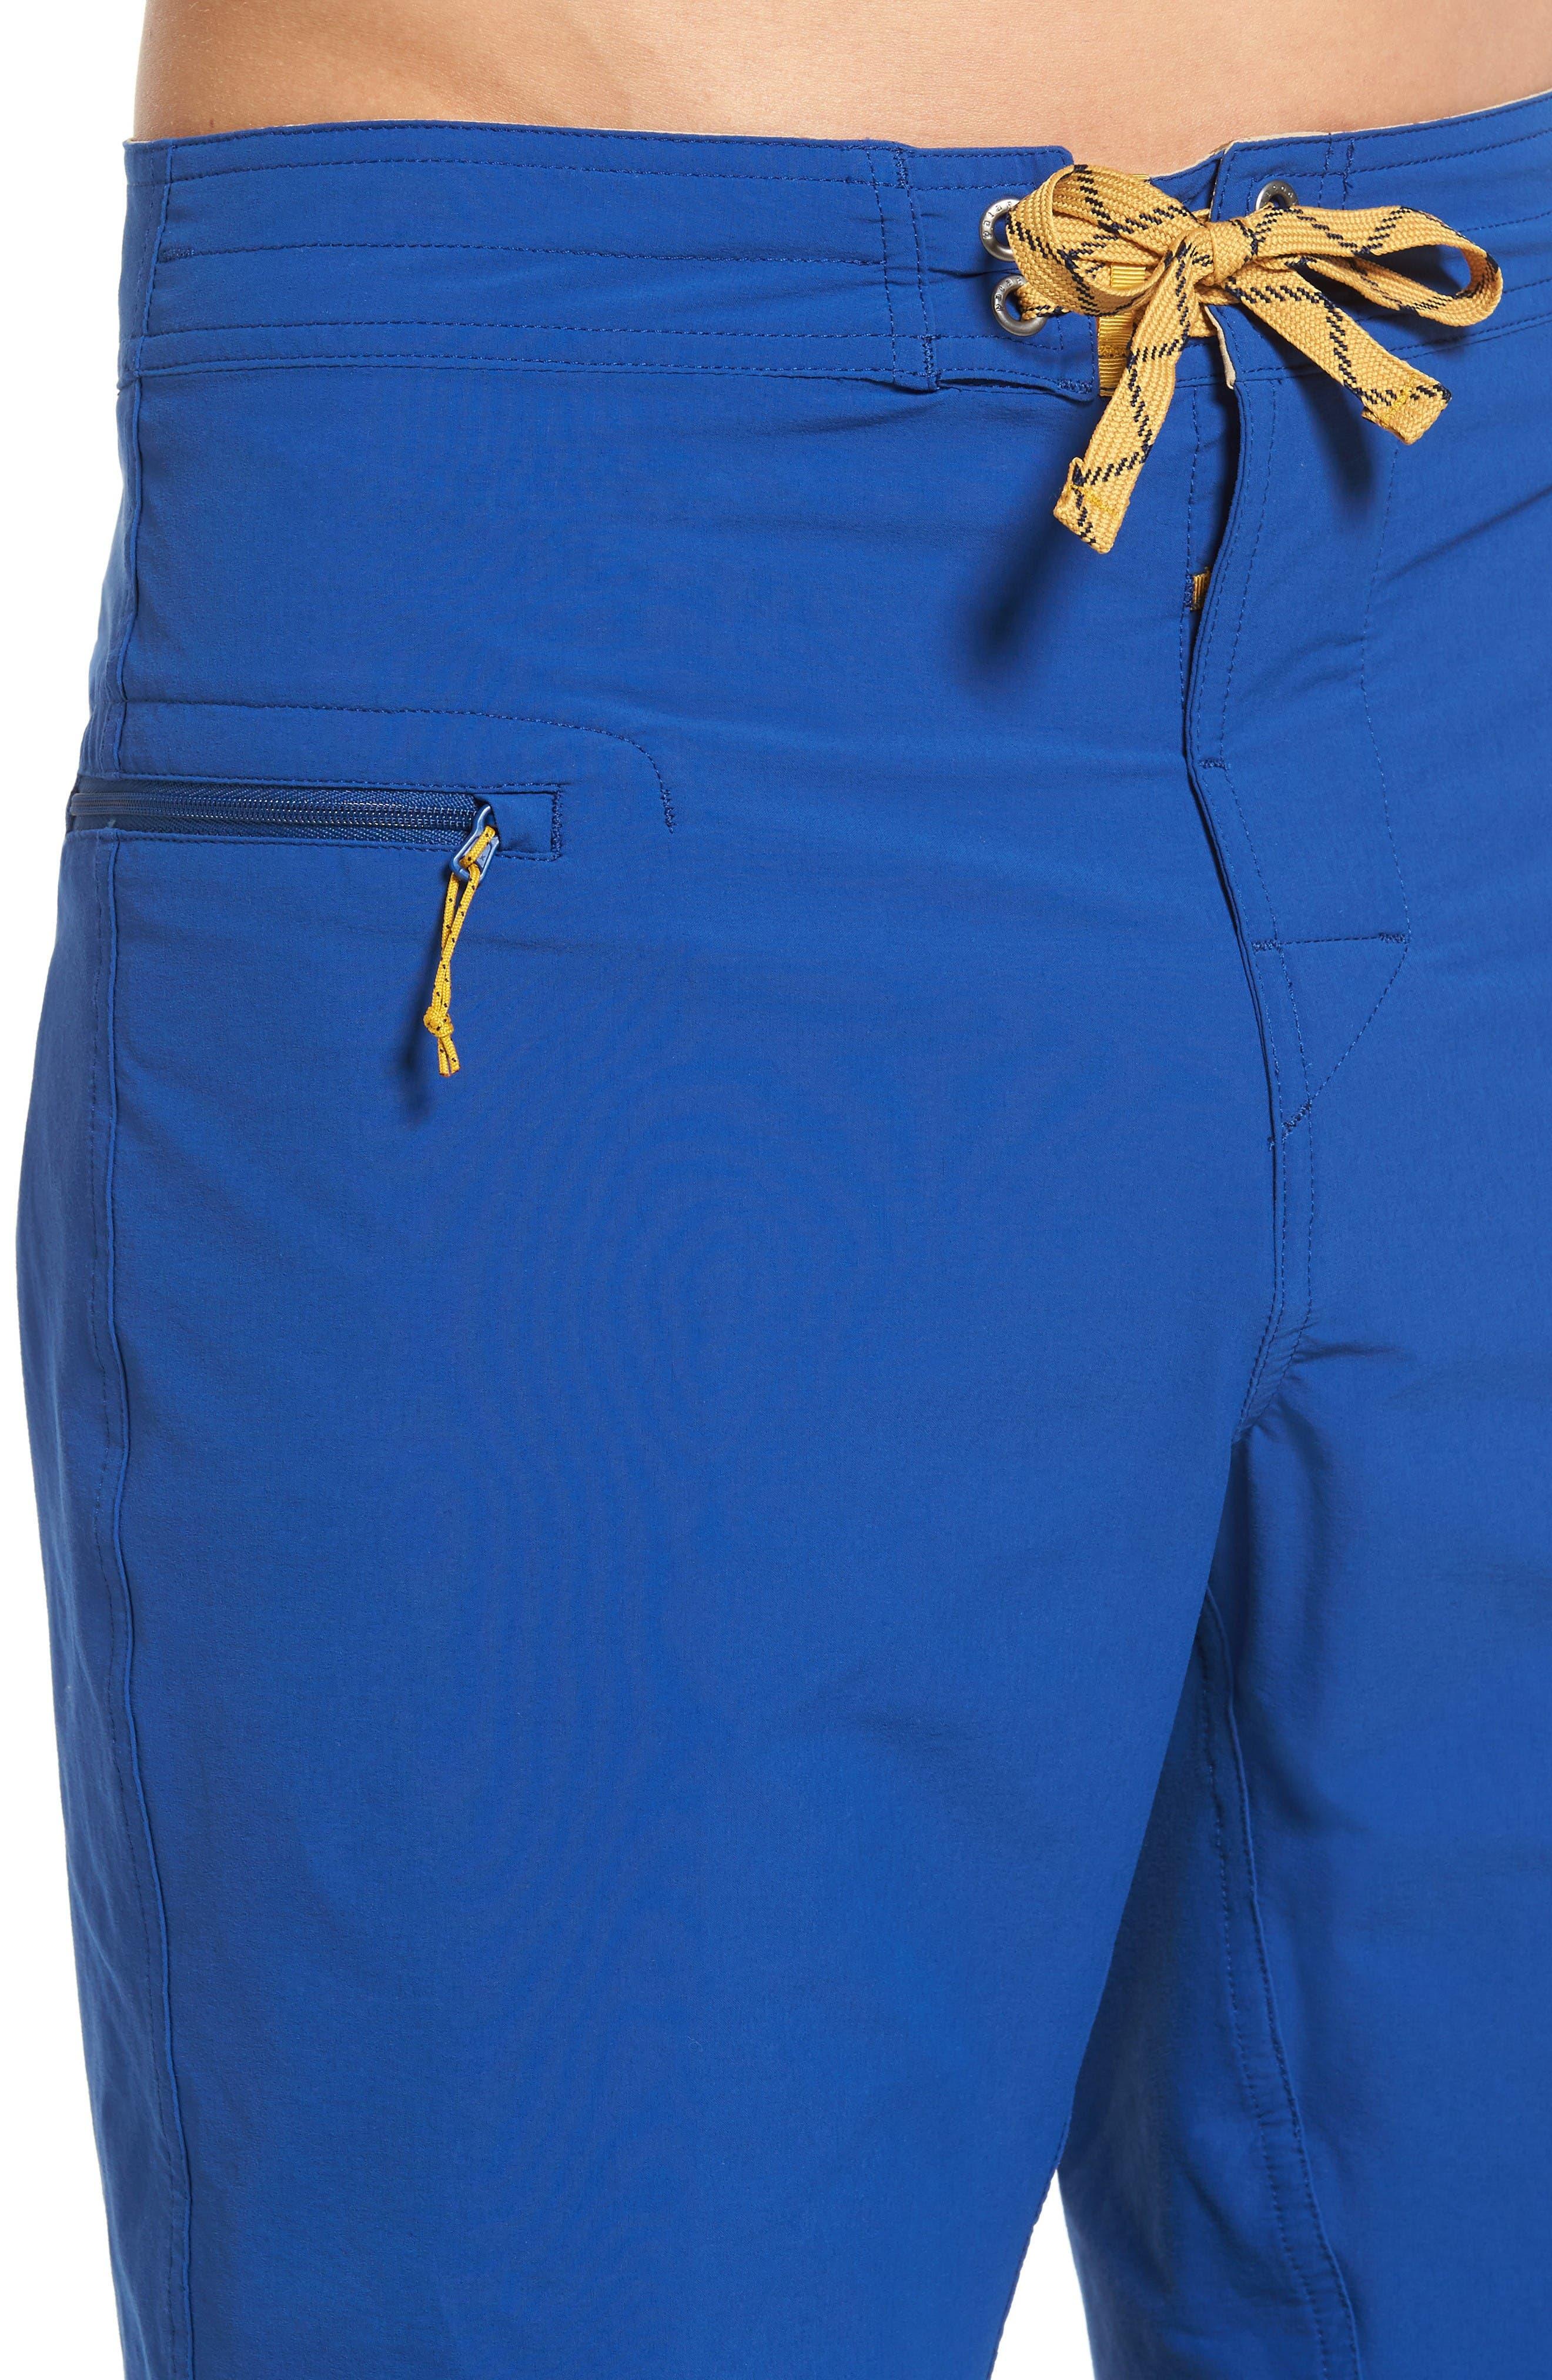 Wavefarer Board Shorts,                             Alternate thumbnail 4, color,                             Blue